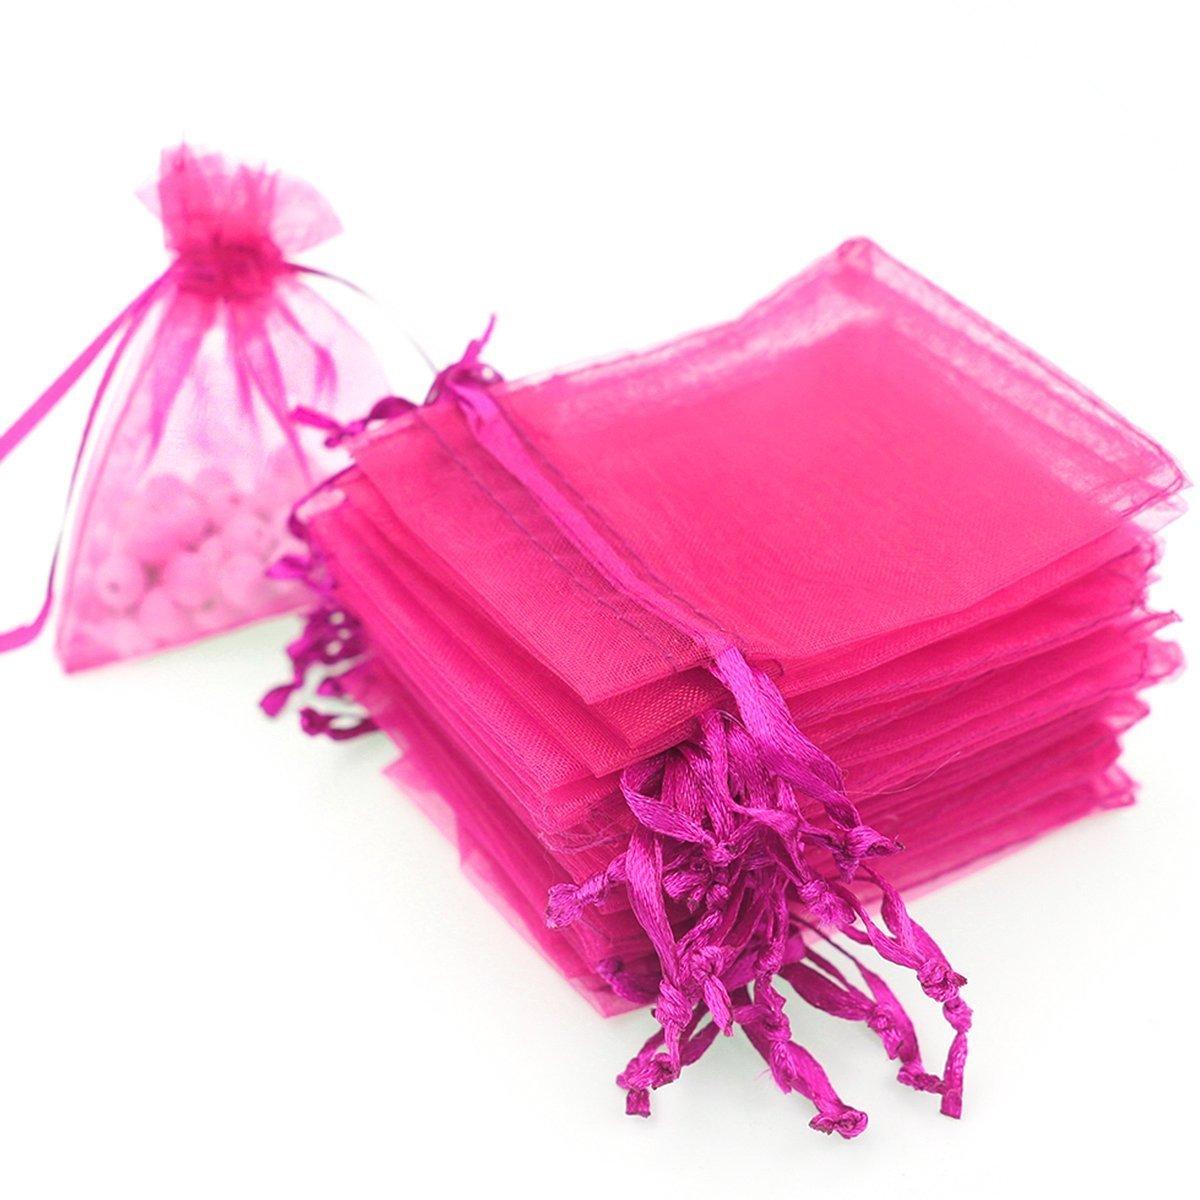 Amazon.com: Dealglad 100pcs Drawstring Organza Jewelry Candy Pouch ...